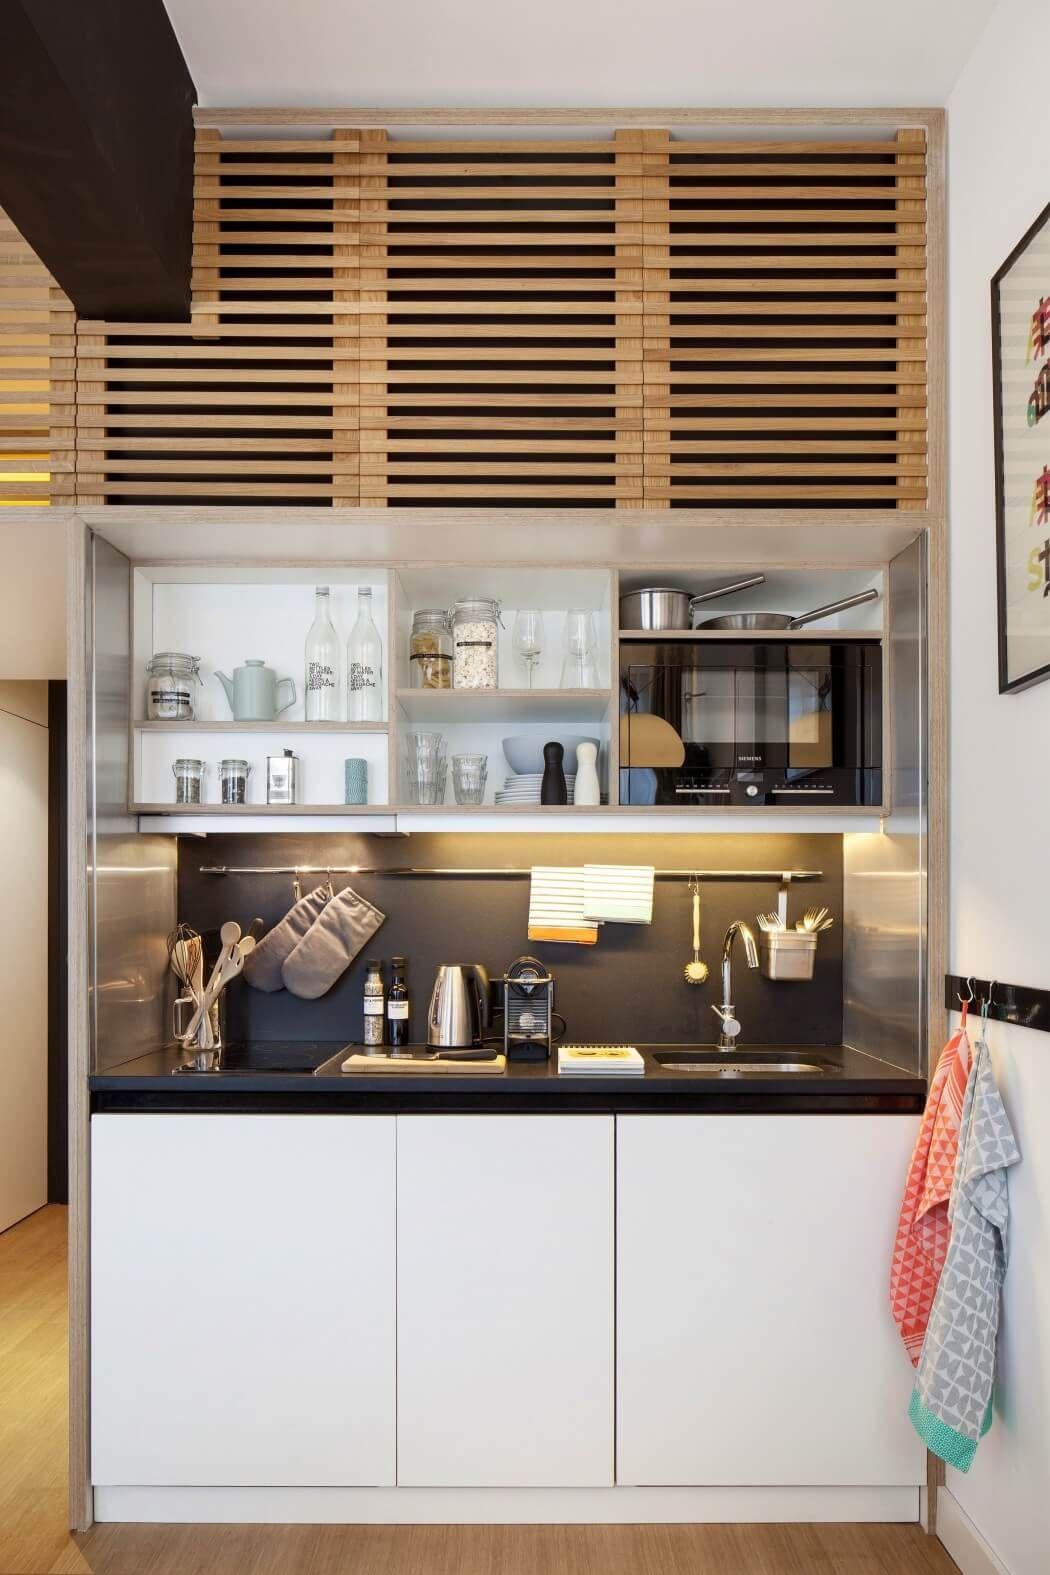 Küchenschränke-kits zoku loft by concrete architectural associates  kitchen  pinterest